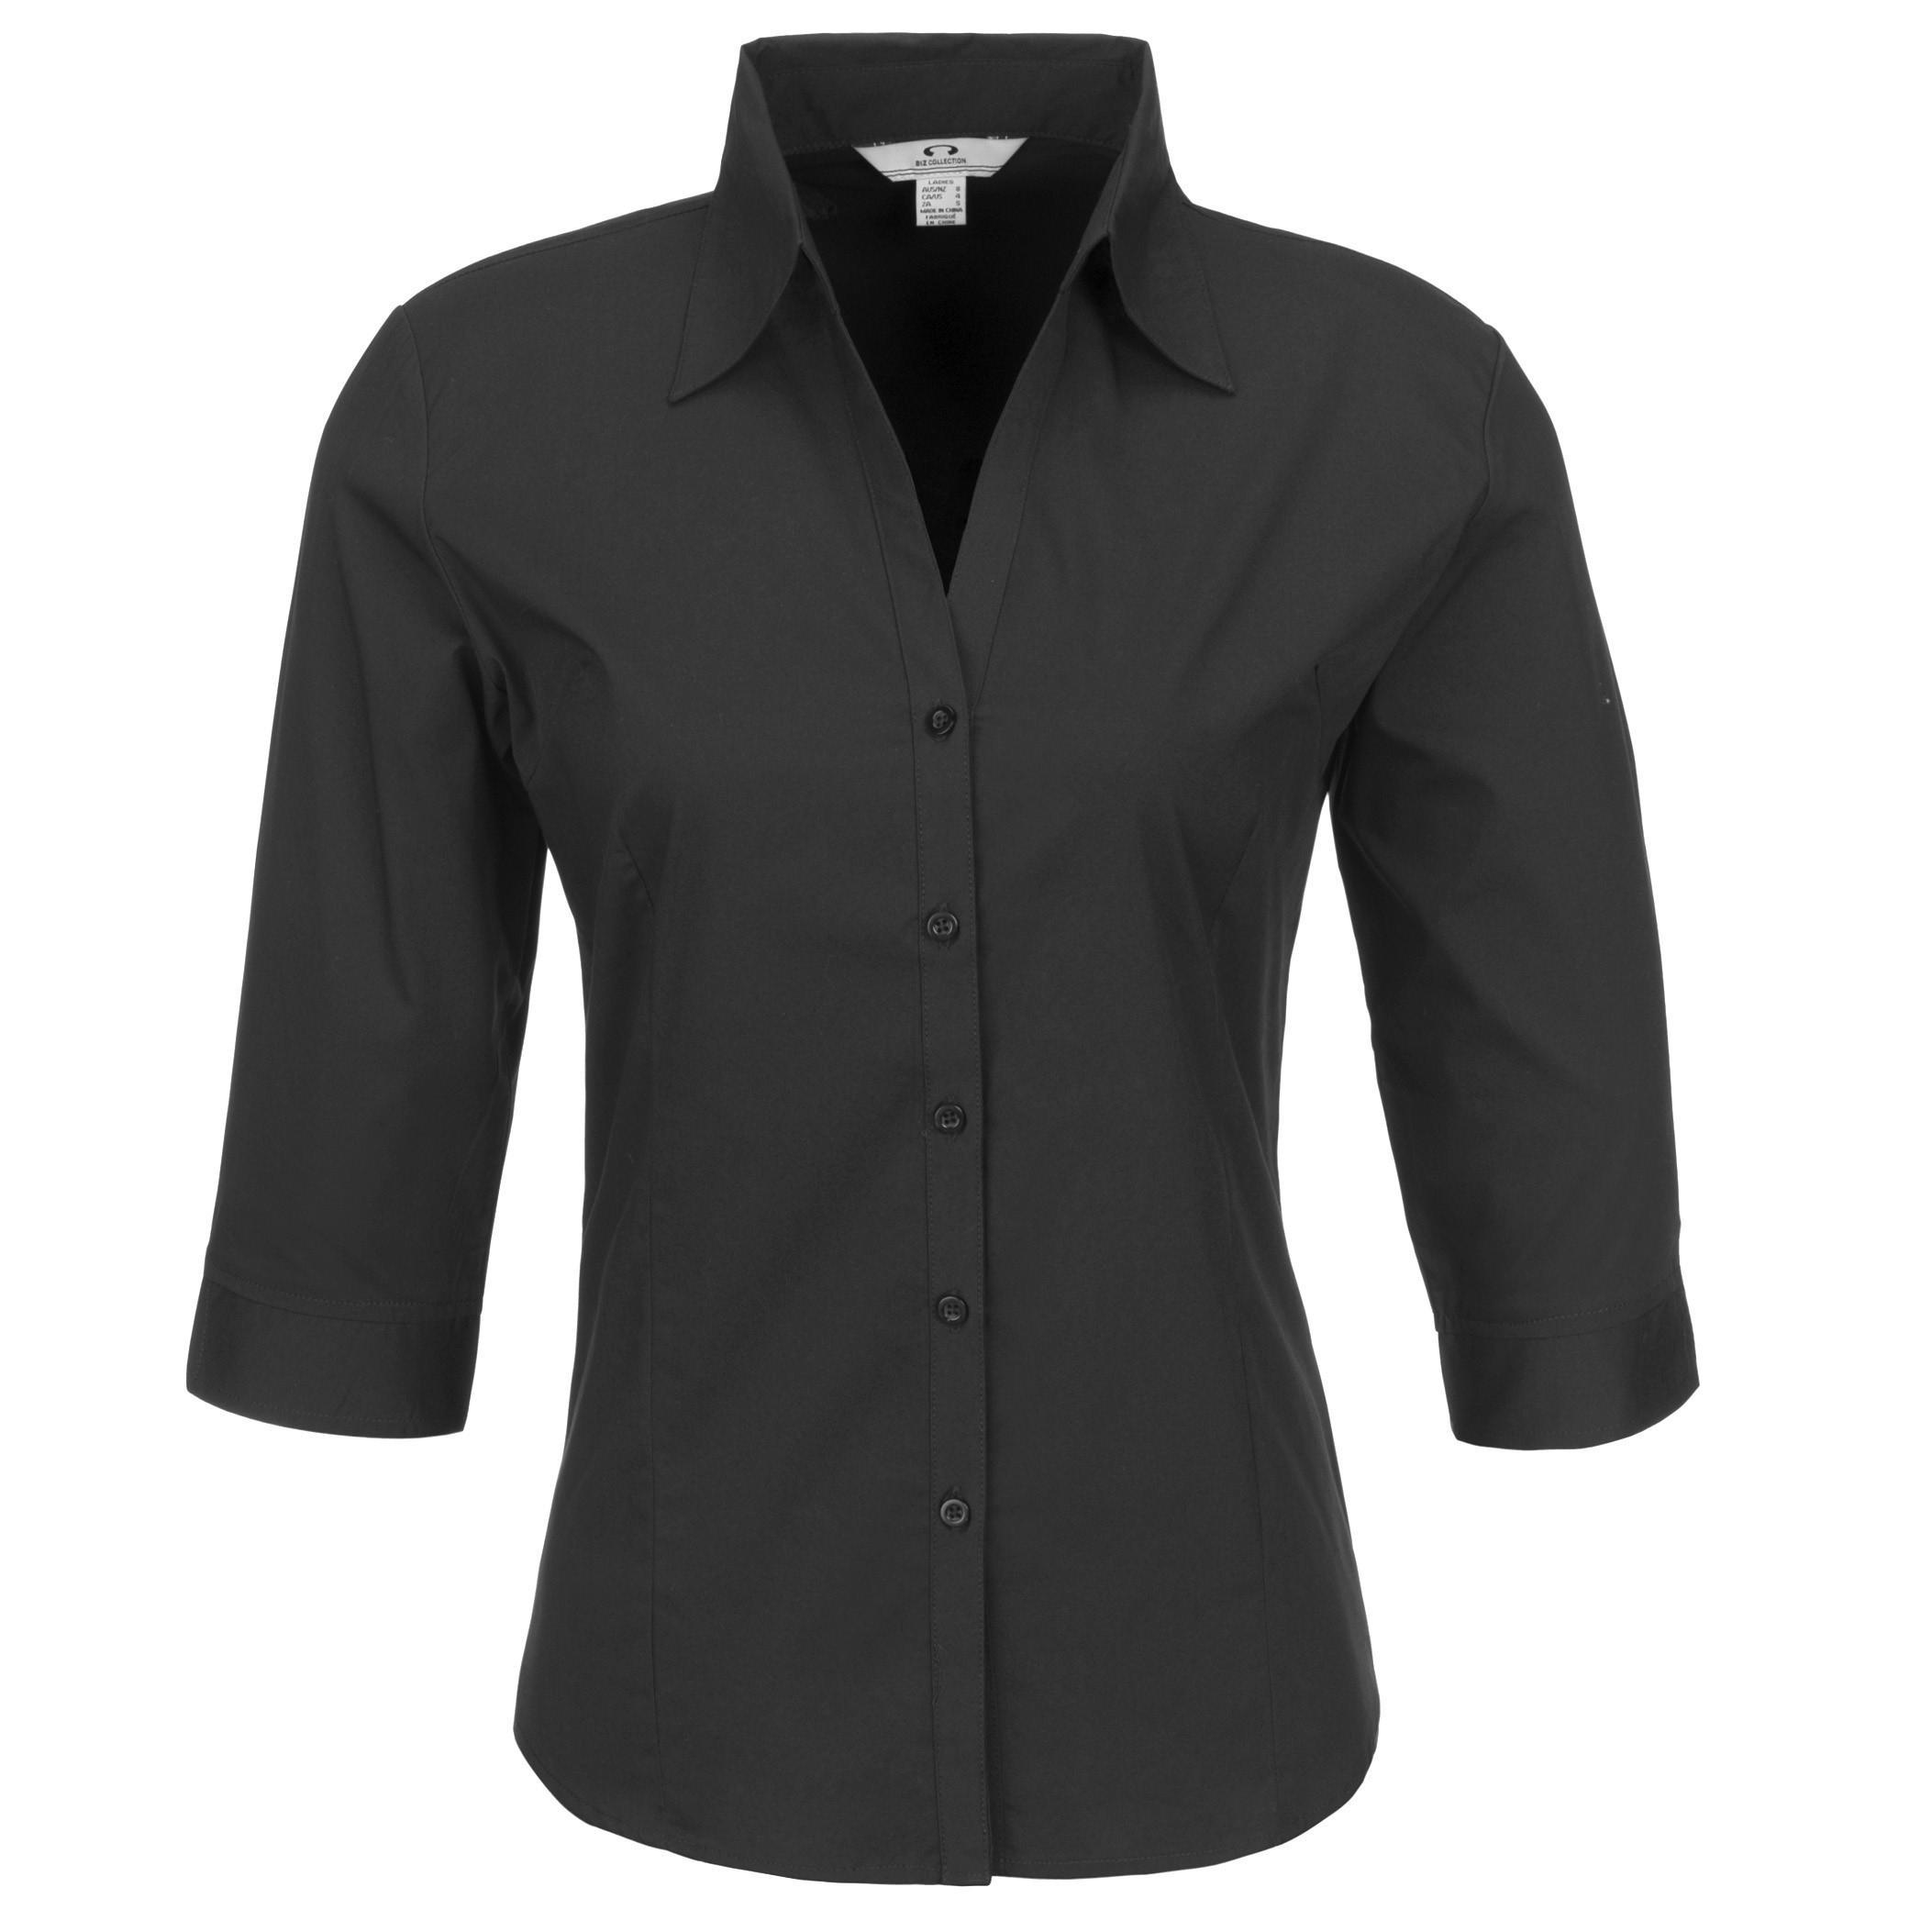 Ladies 3/4 Sleeve Metro Shirt - Black Only